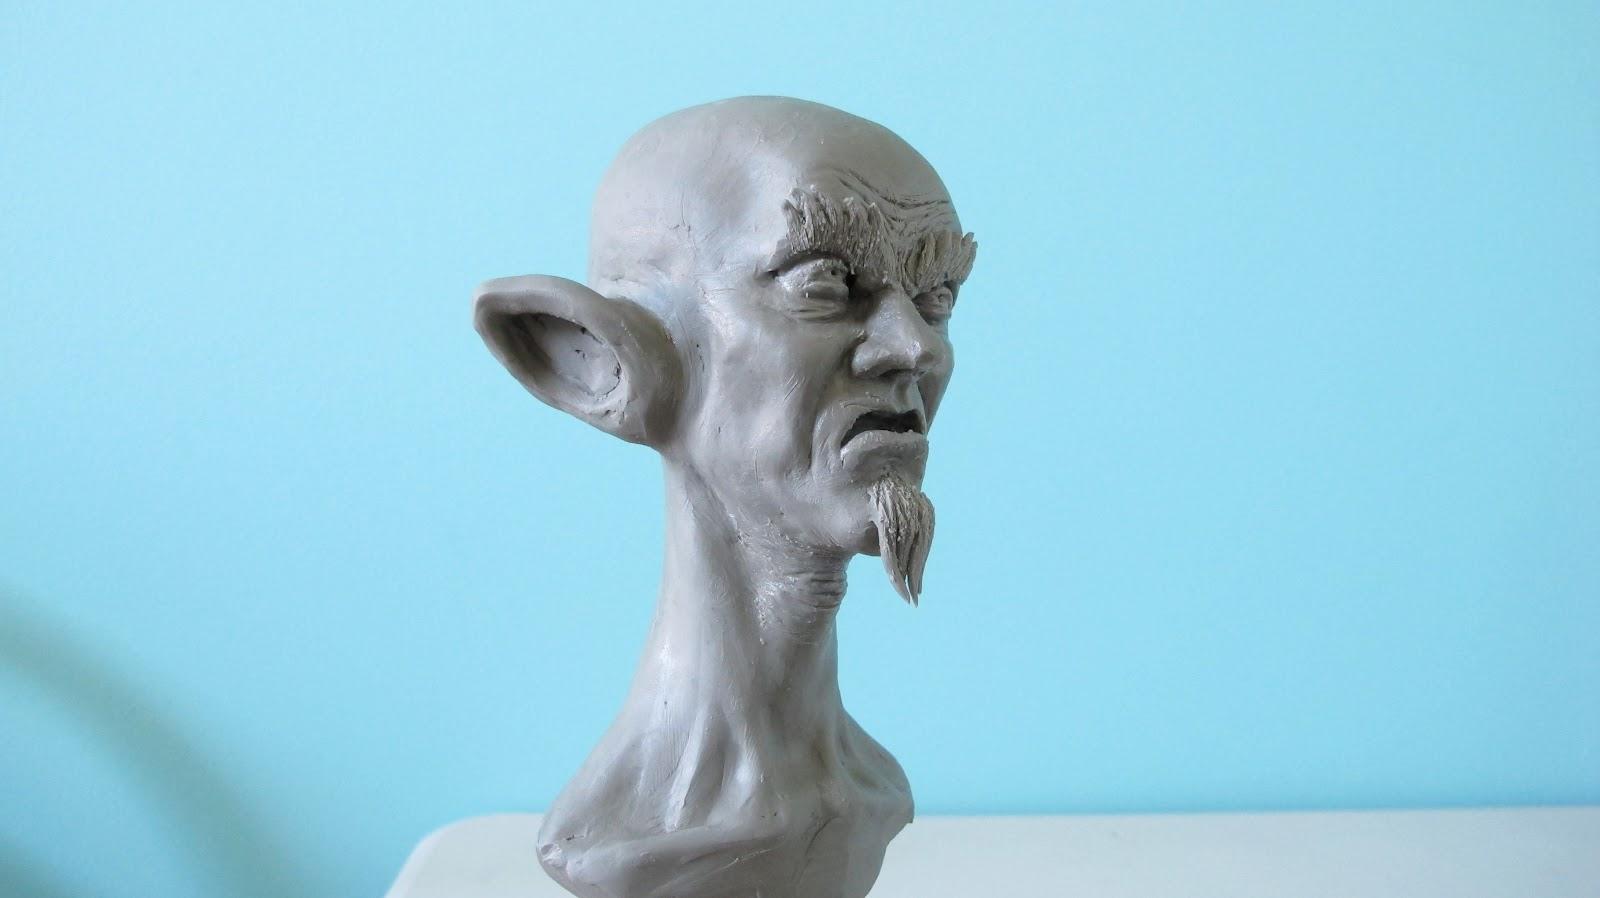 louis blanchet  sculpture compl u00e8ter  u00e0 90